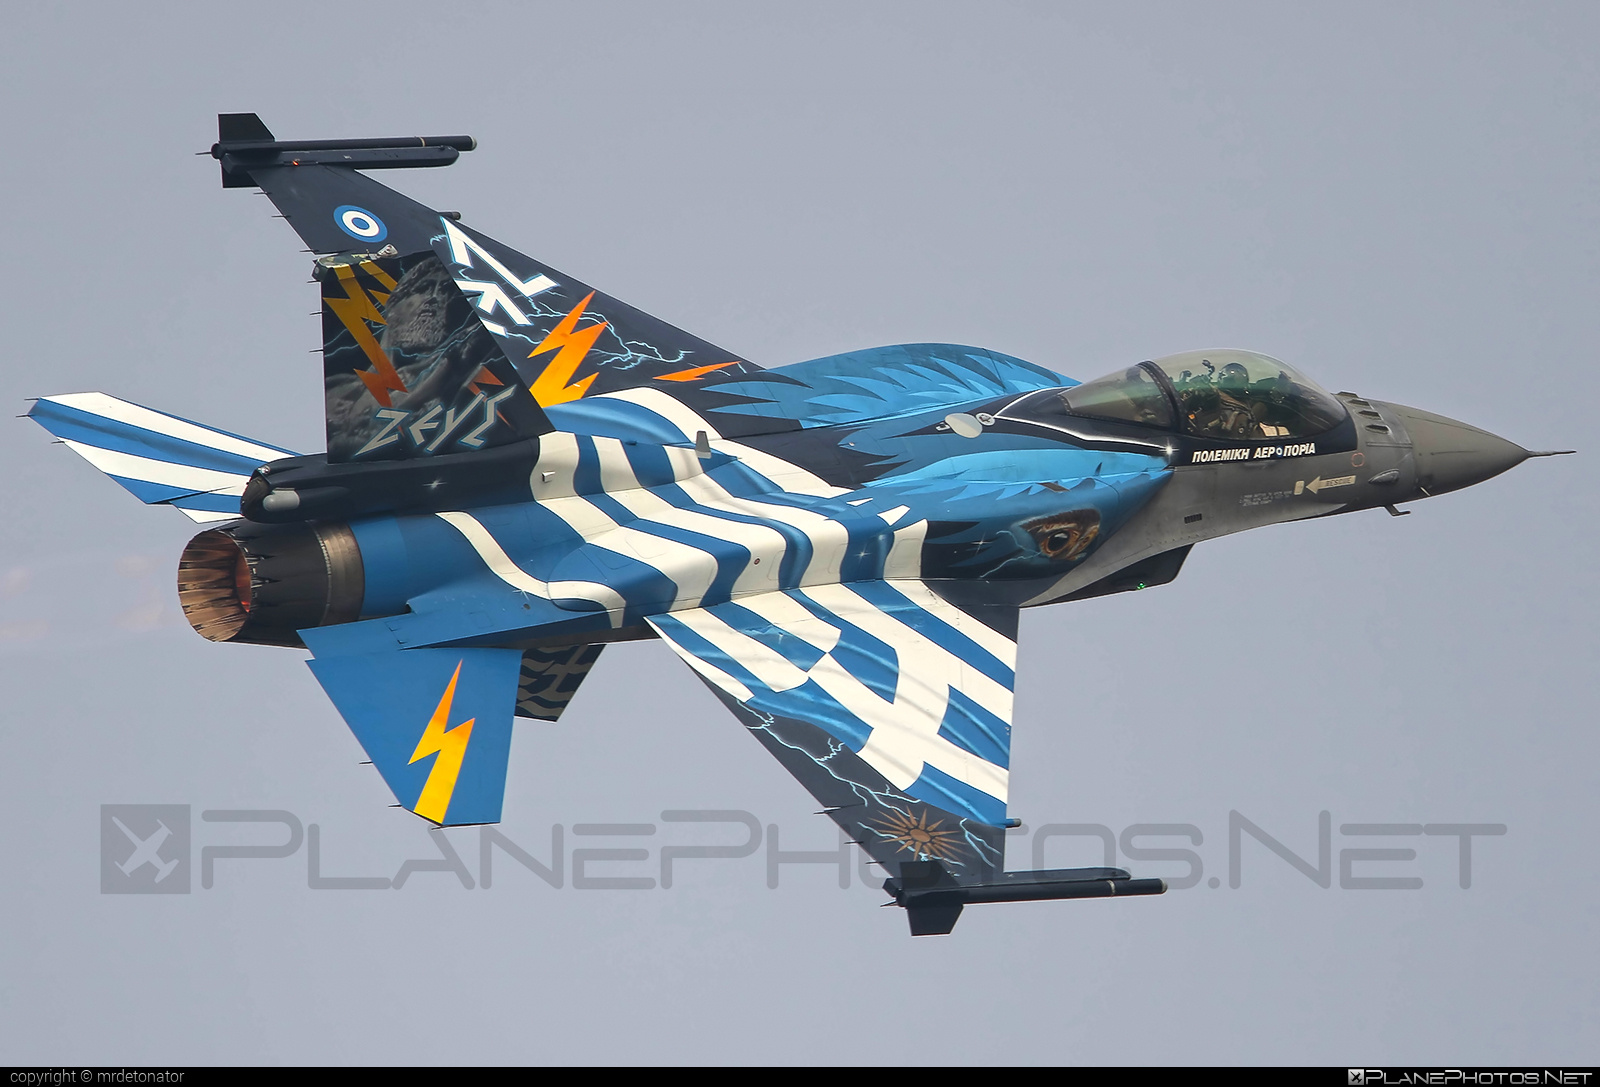 Lockheed Martin F-16CJ Fighting Falcon - 523 operated by Polemikí Aeroporía (Hellenic Air Force) #f16 #f16cj #fightingfalcon #hellenicairforce #lockheedmartin #natodays #natodays2015 #polemikiaeroporia